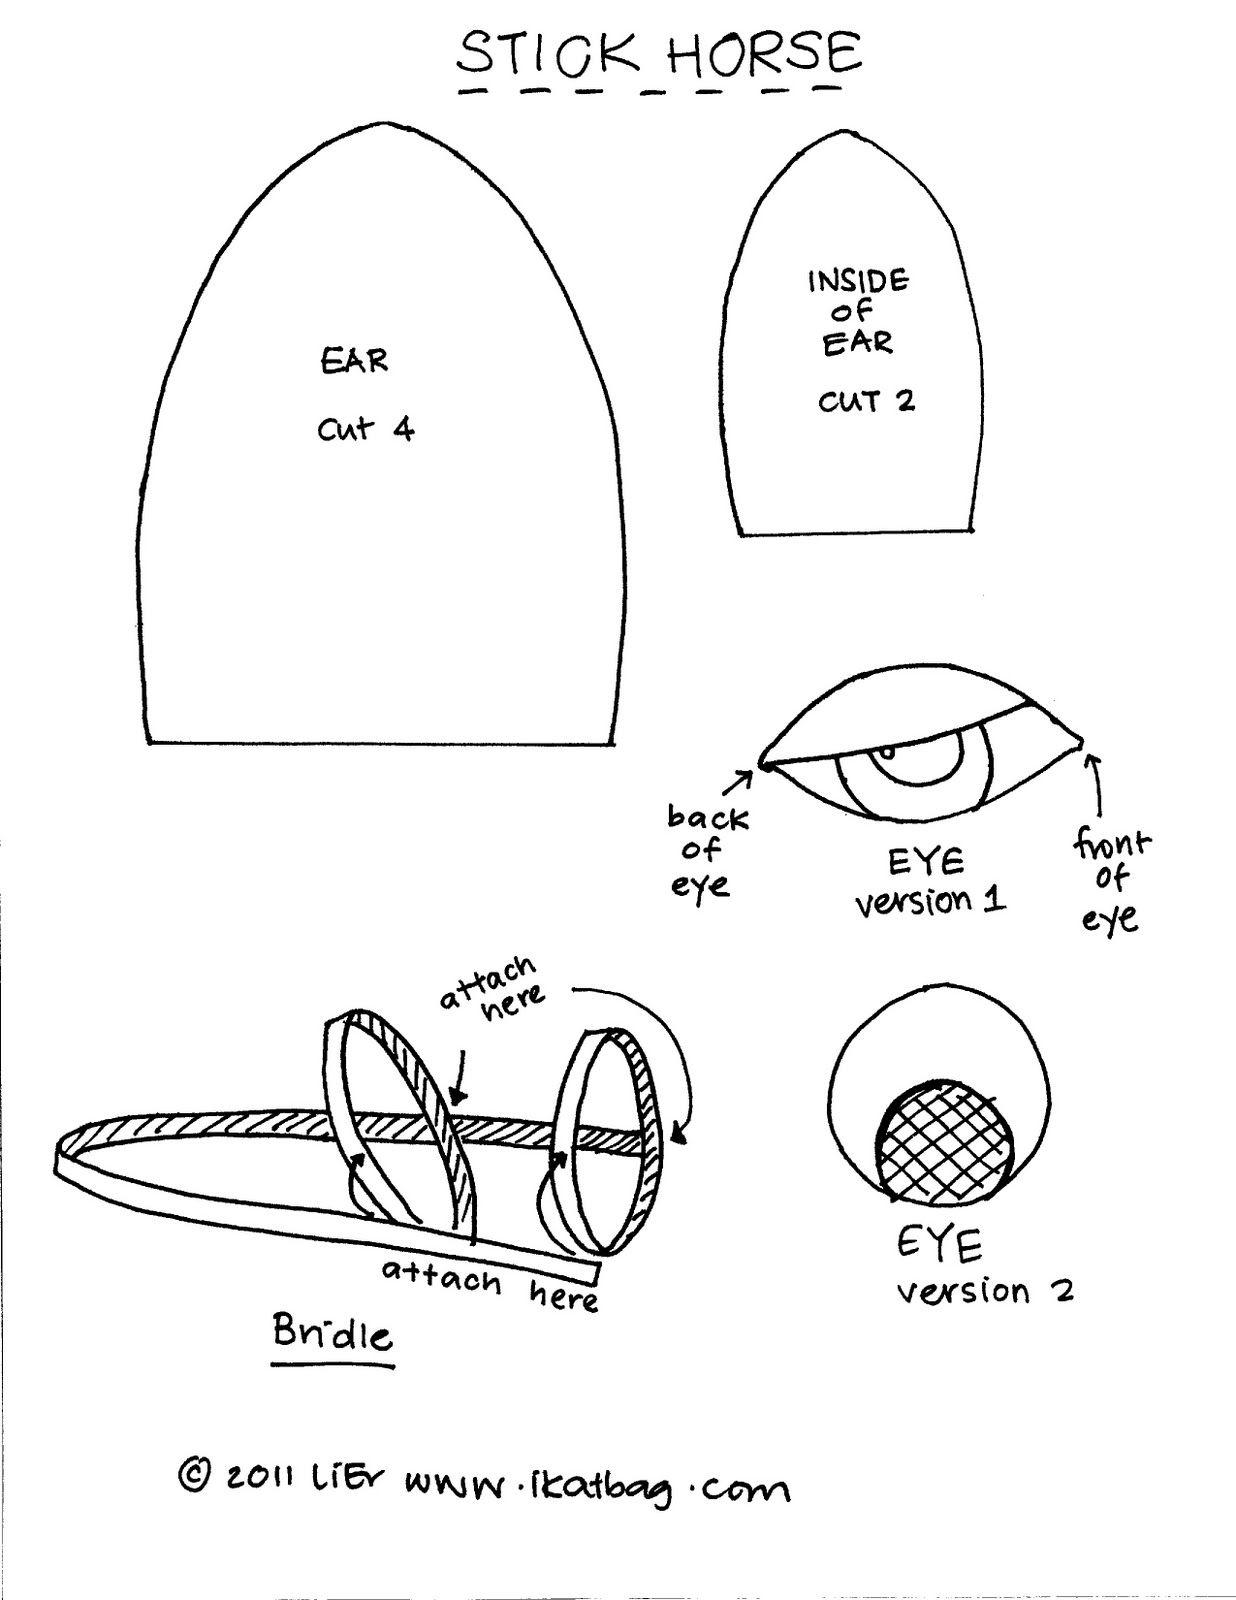 Ikat Bag How To Make A Stick Horse